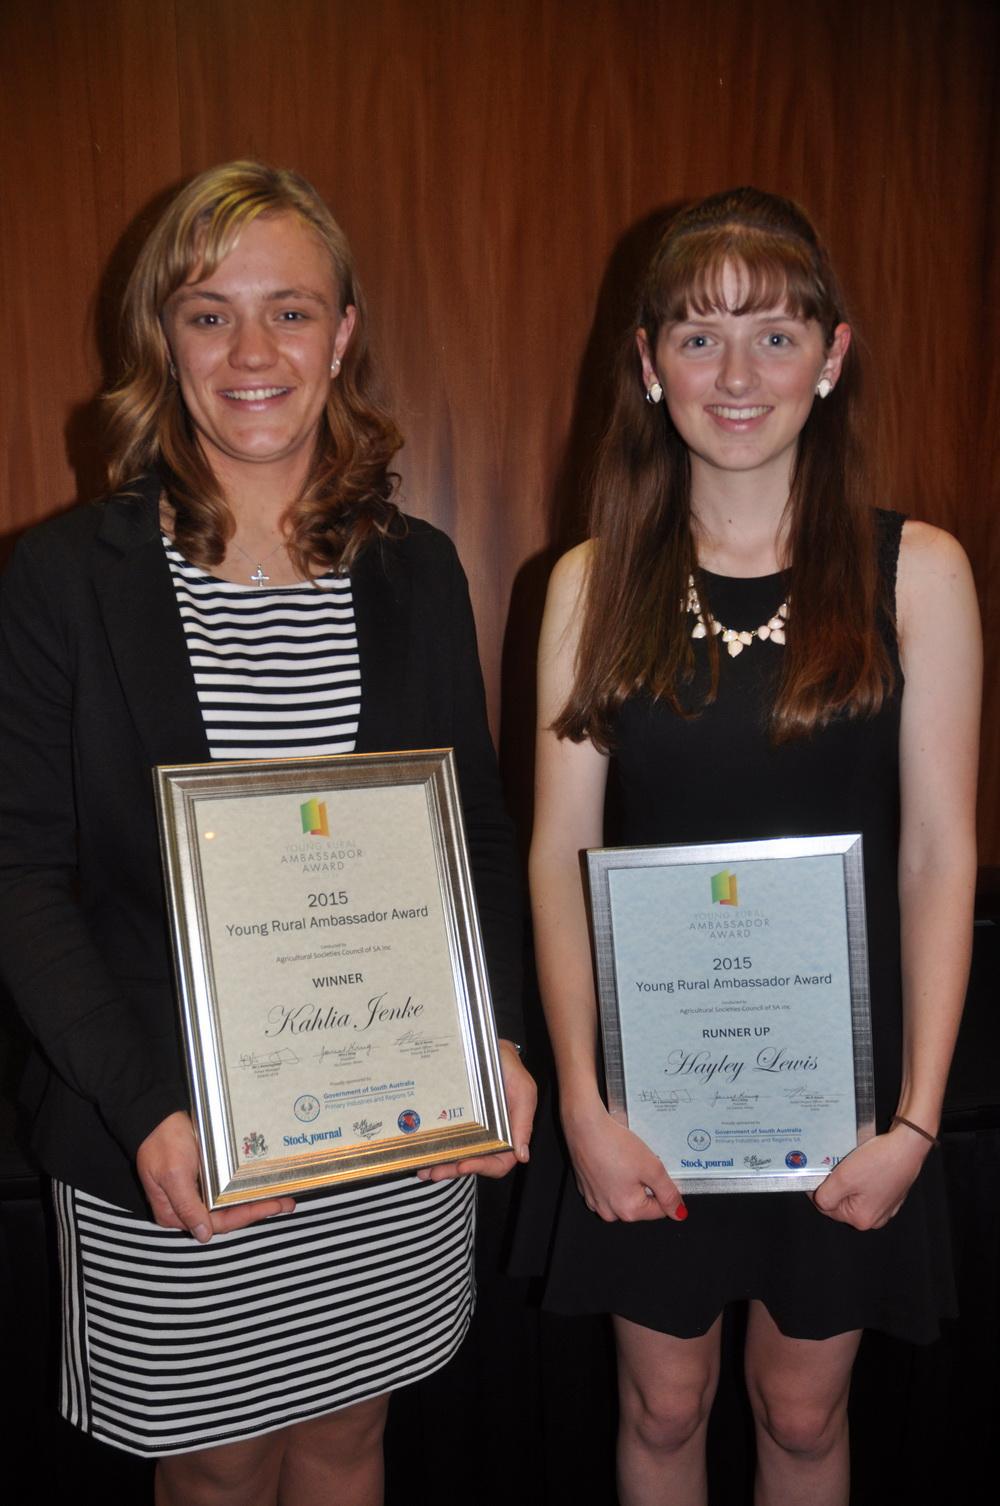 2015 Young Rural Ambassador Award Winner and Runner Up